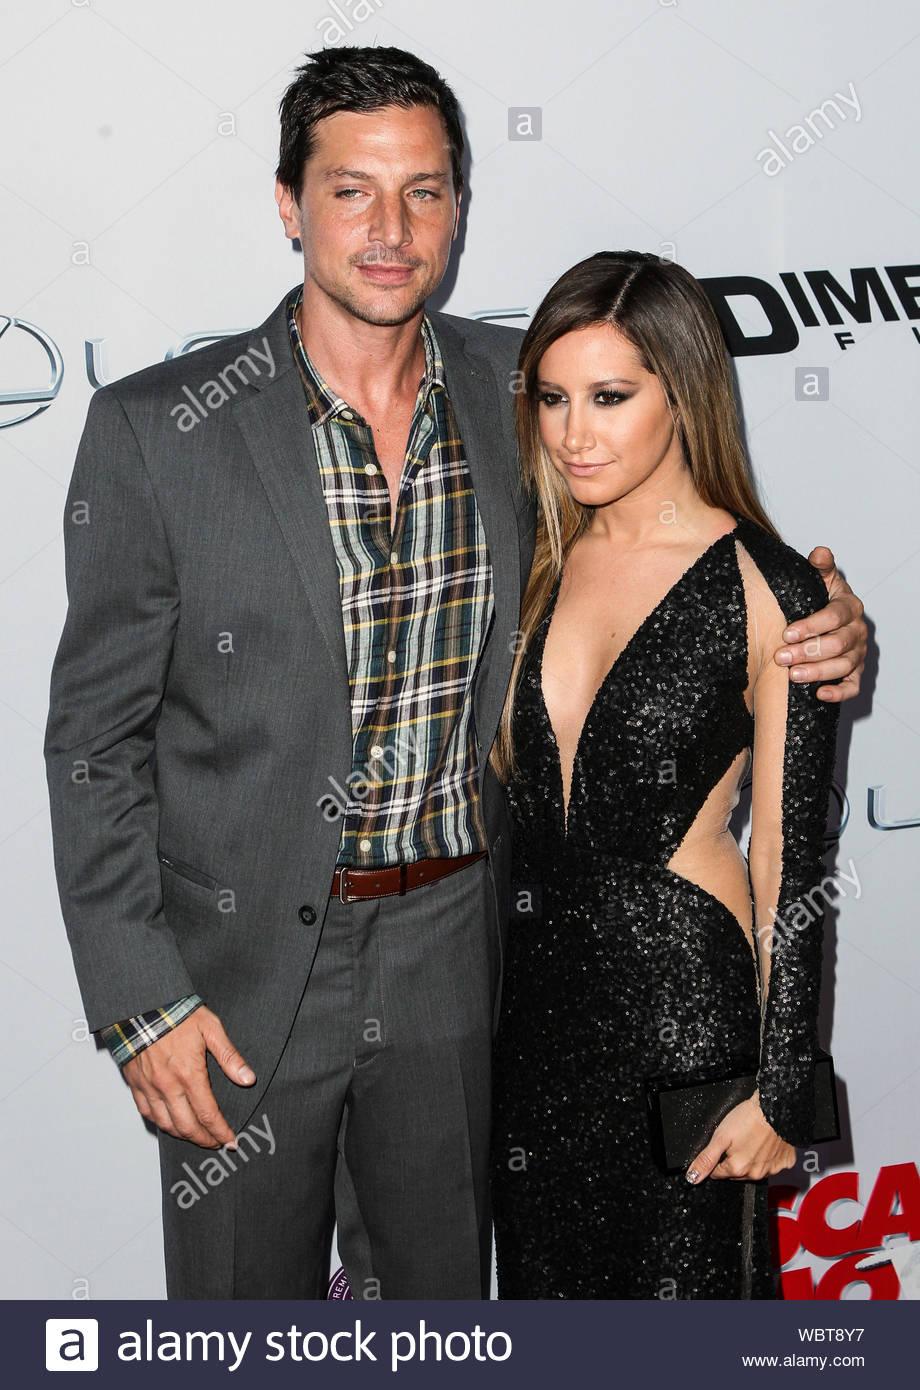 Simon Rex dating Ashley Tisdale